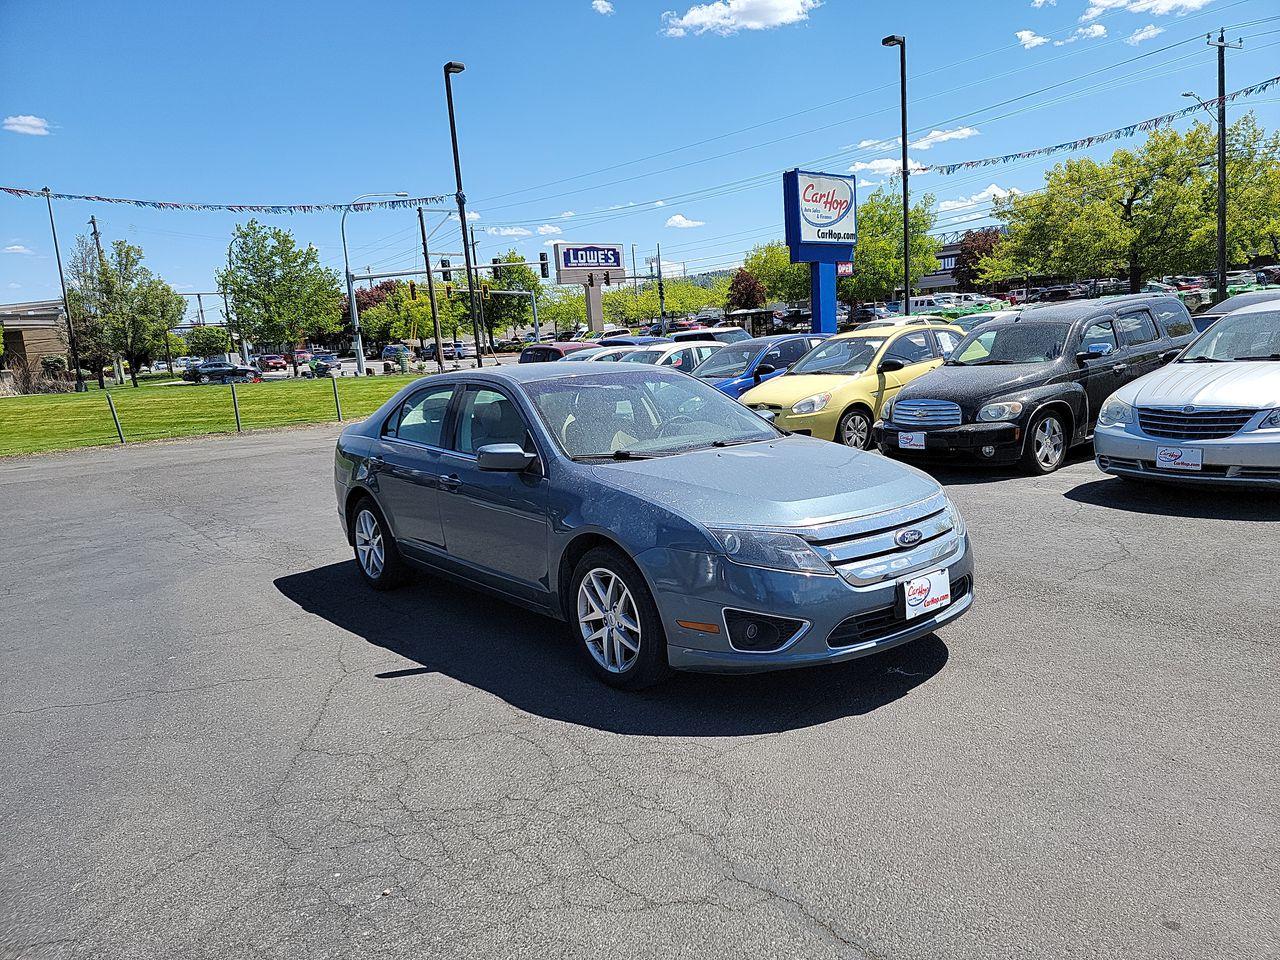 Pre-Owned 2012 FORD FUSION SEL Sedan